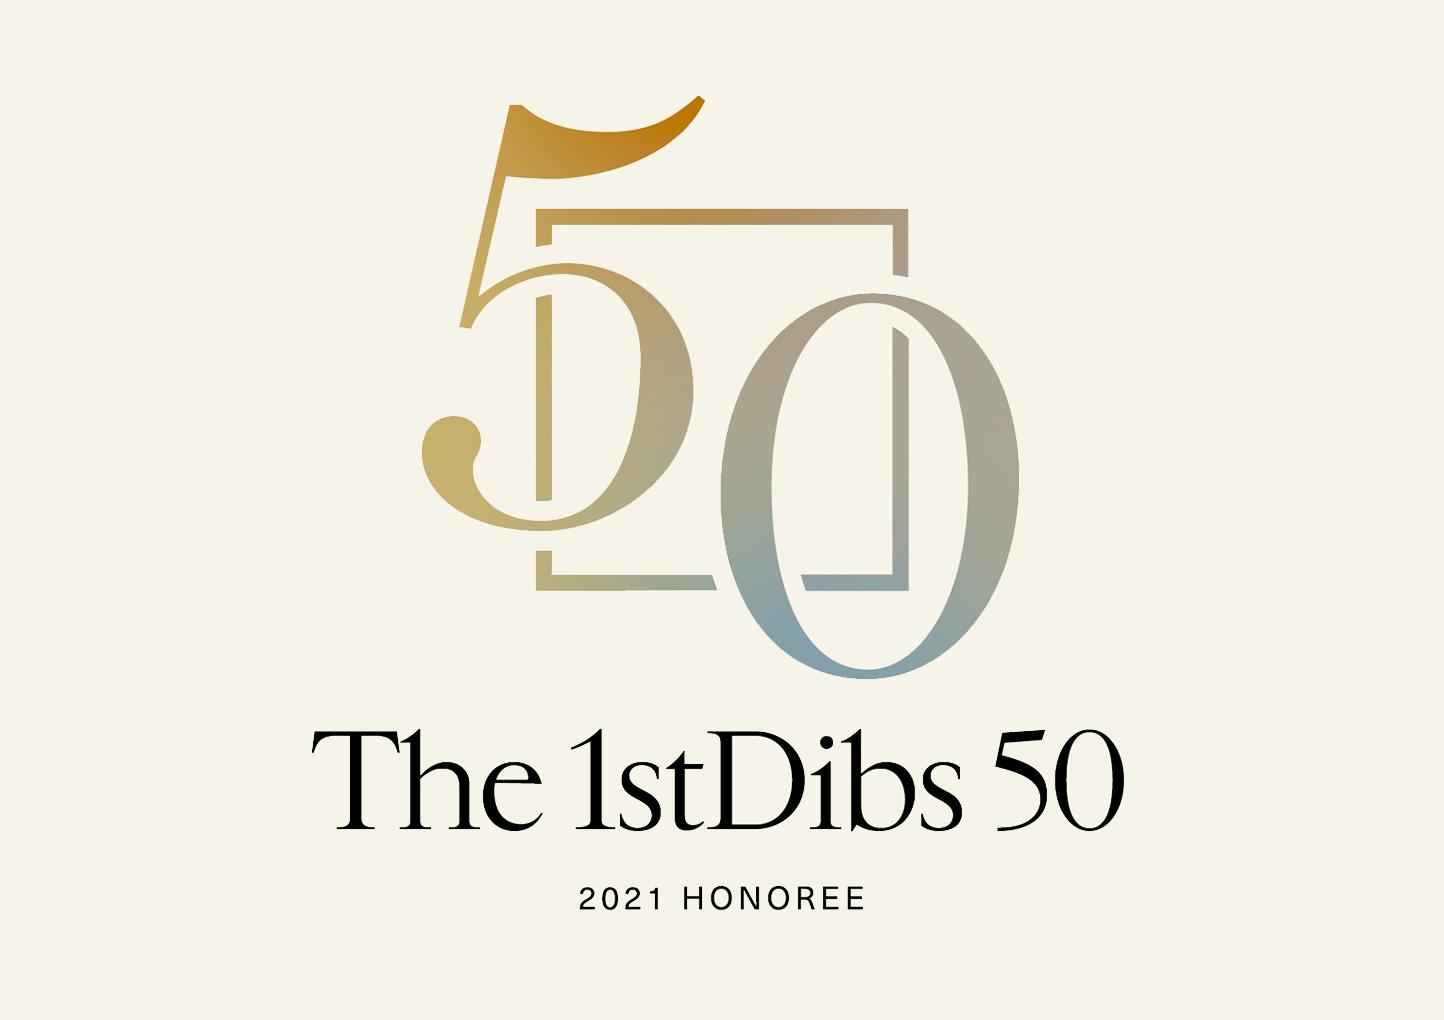 2021 1stDibs 50